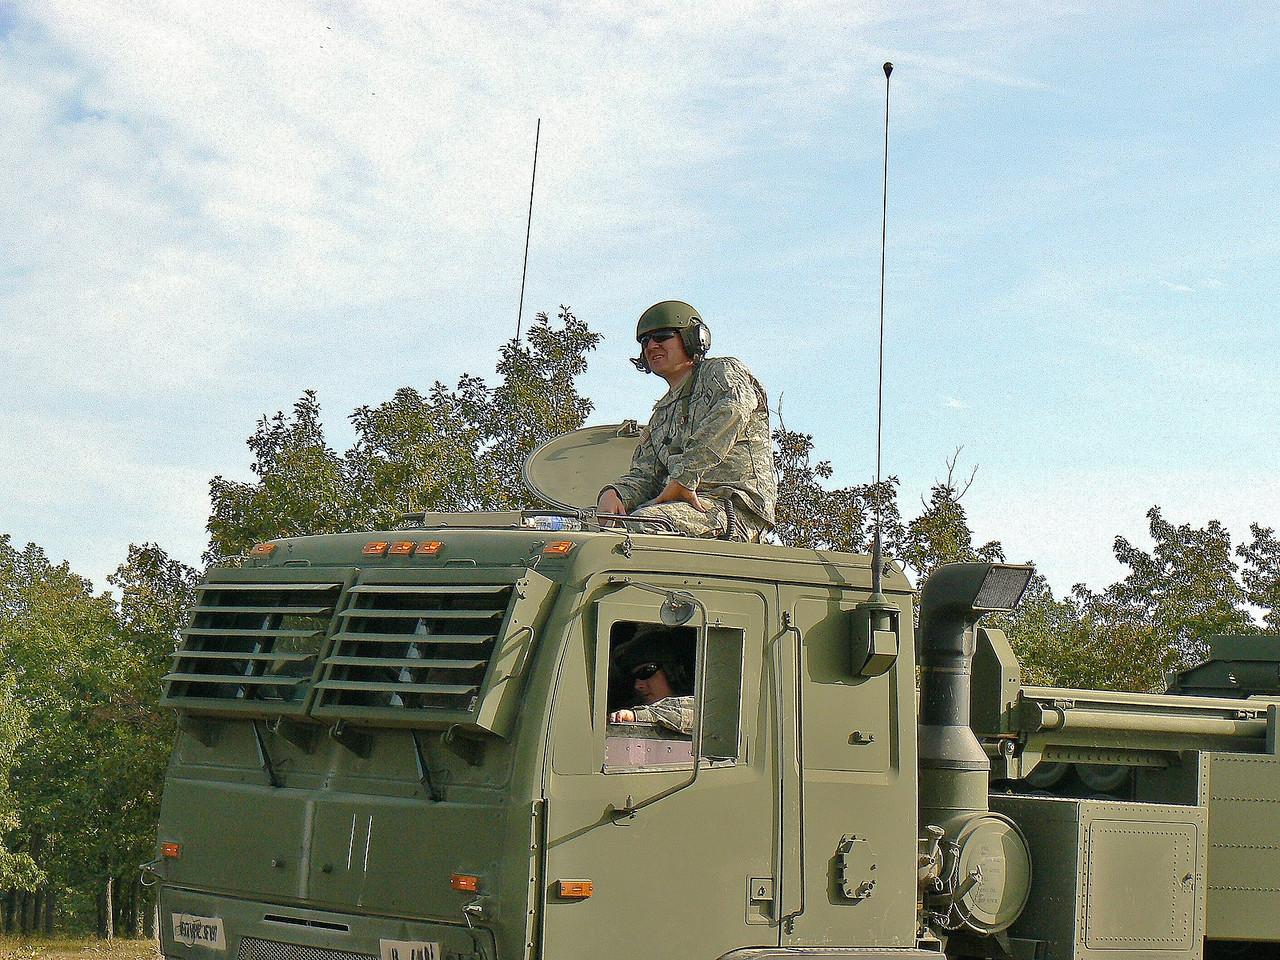 SSG Austin & SPC Maynard, Launcher 11